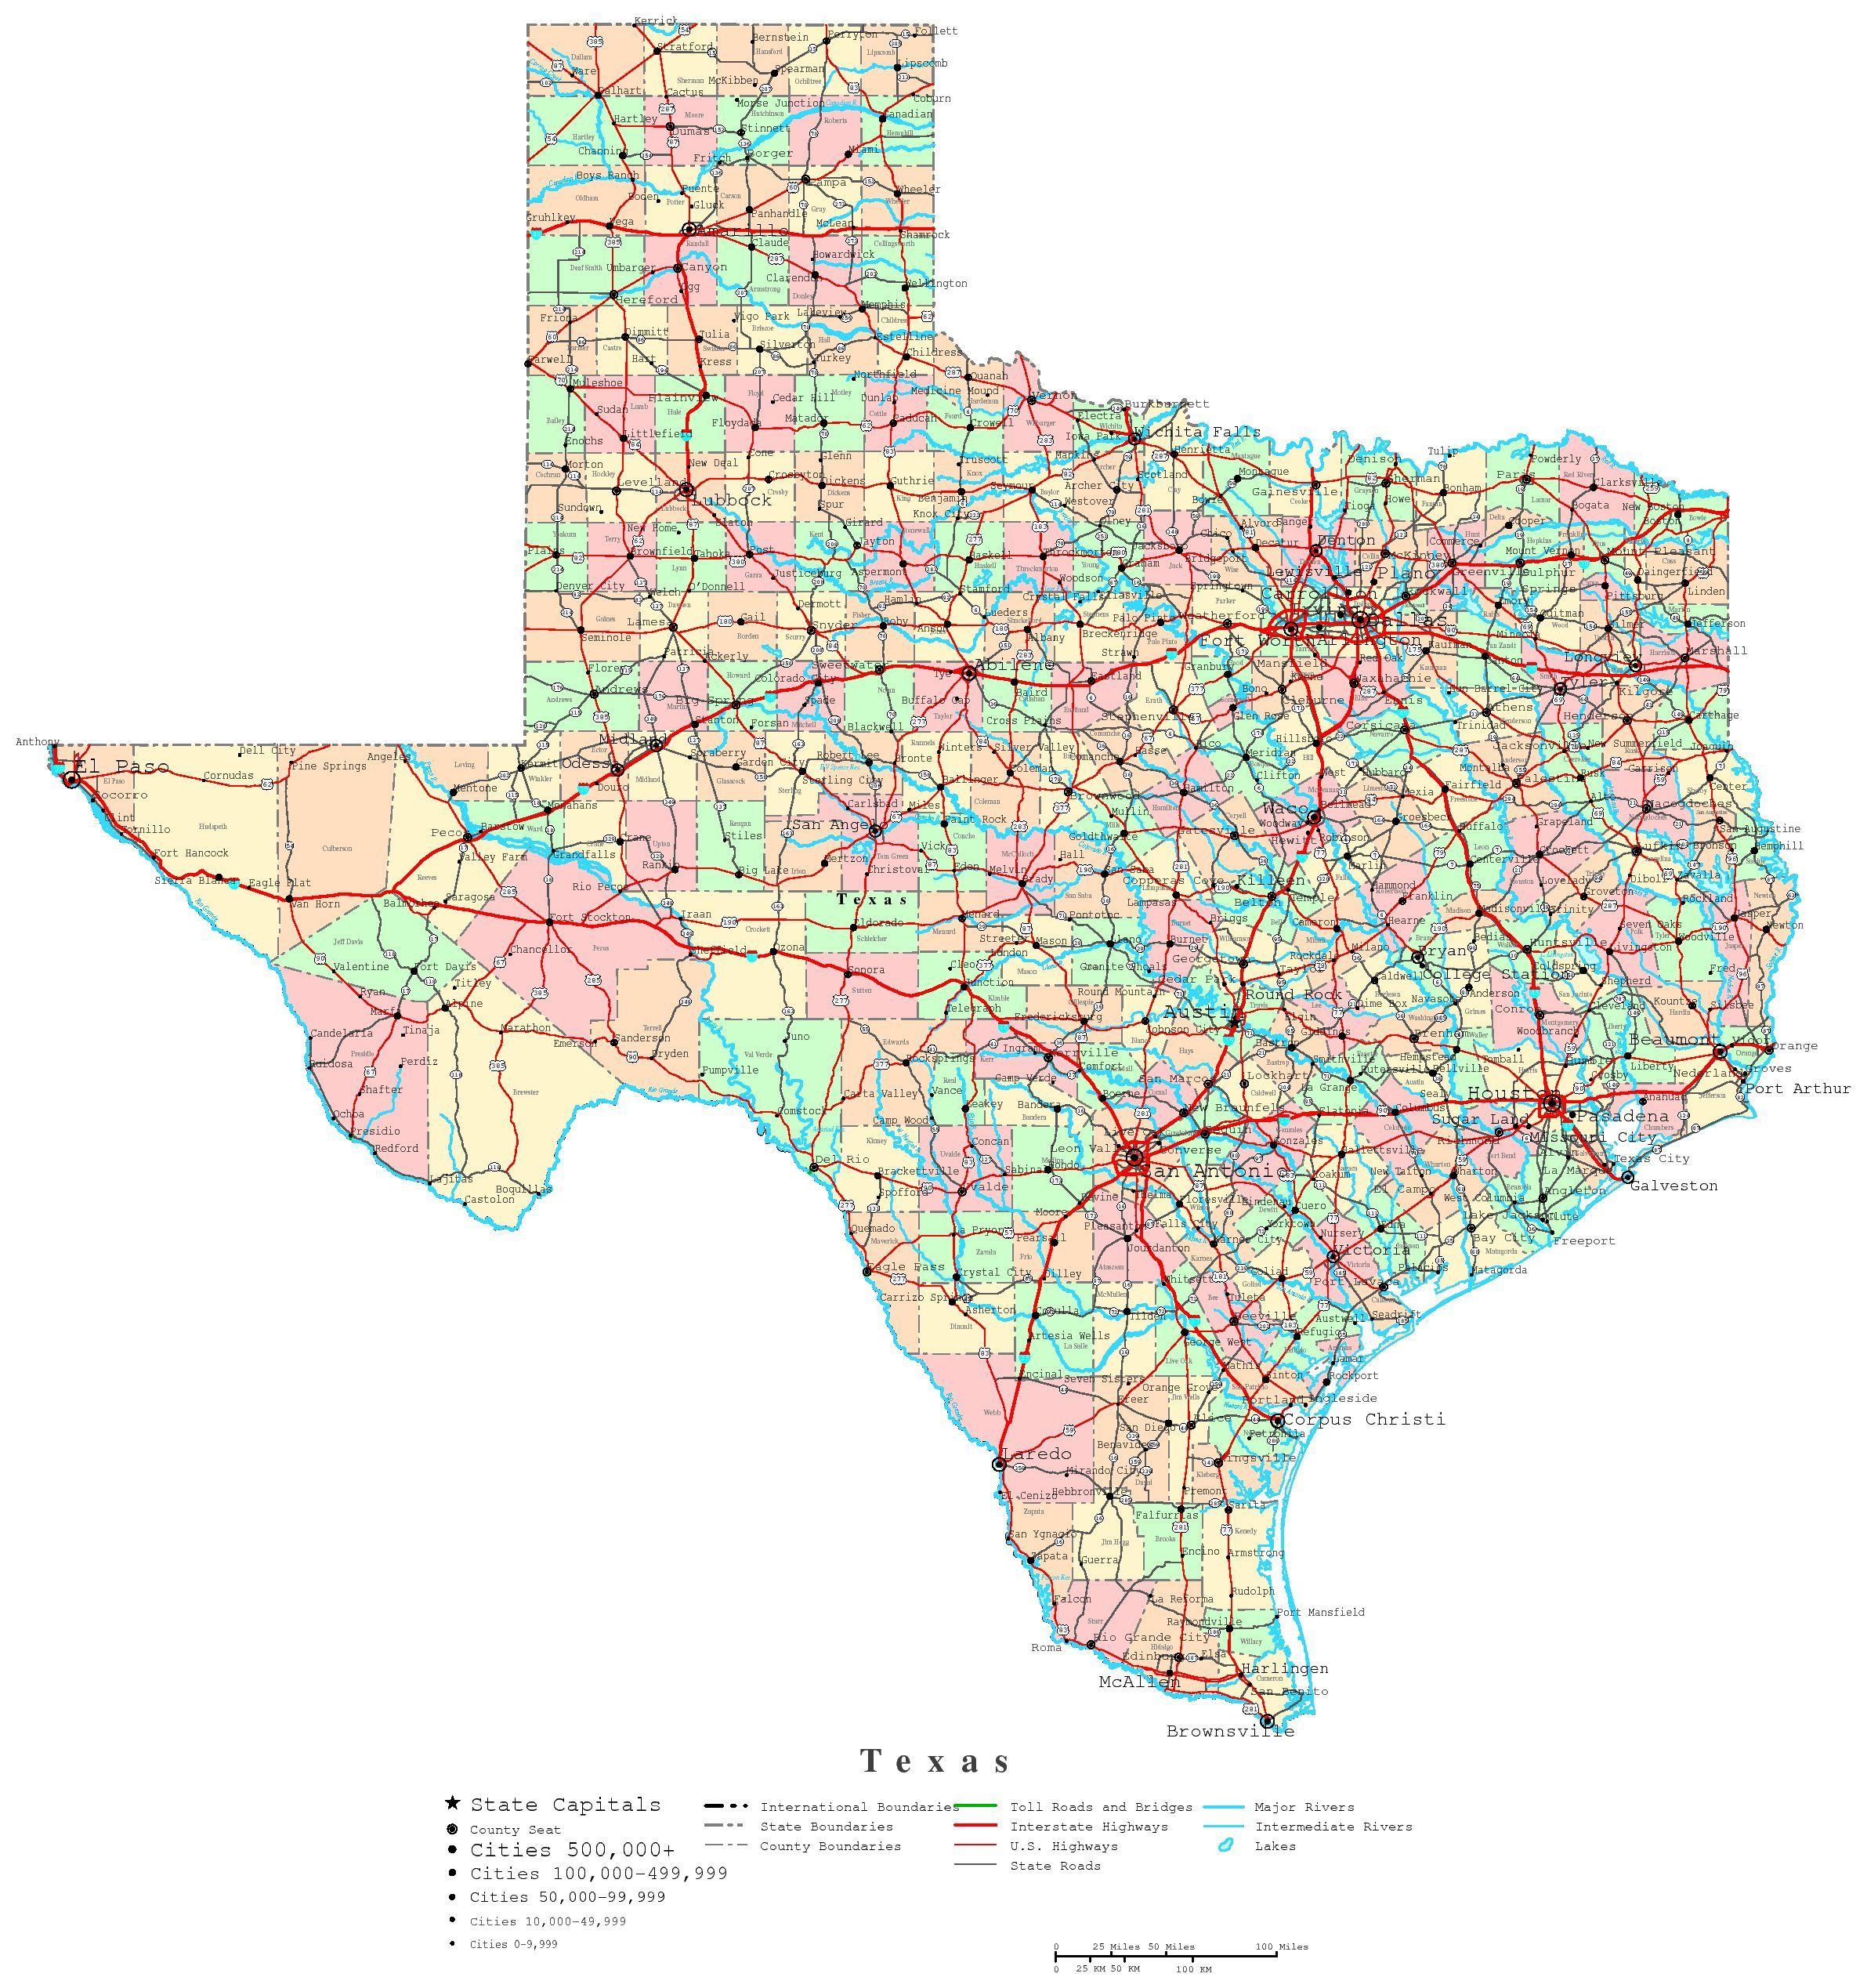 Printable Map Of Texas | Useful Info | Pinterest | Printable Maps - Free Printable State Maps